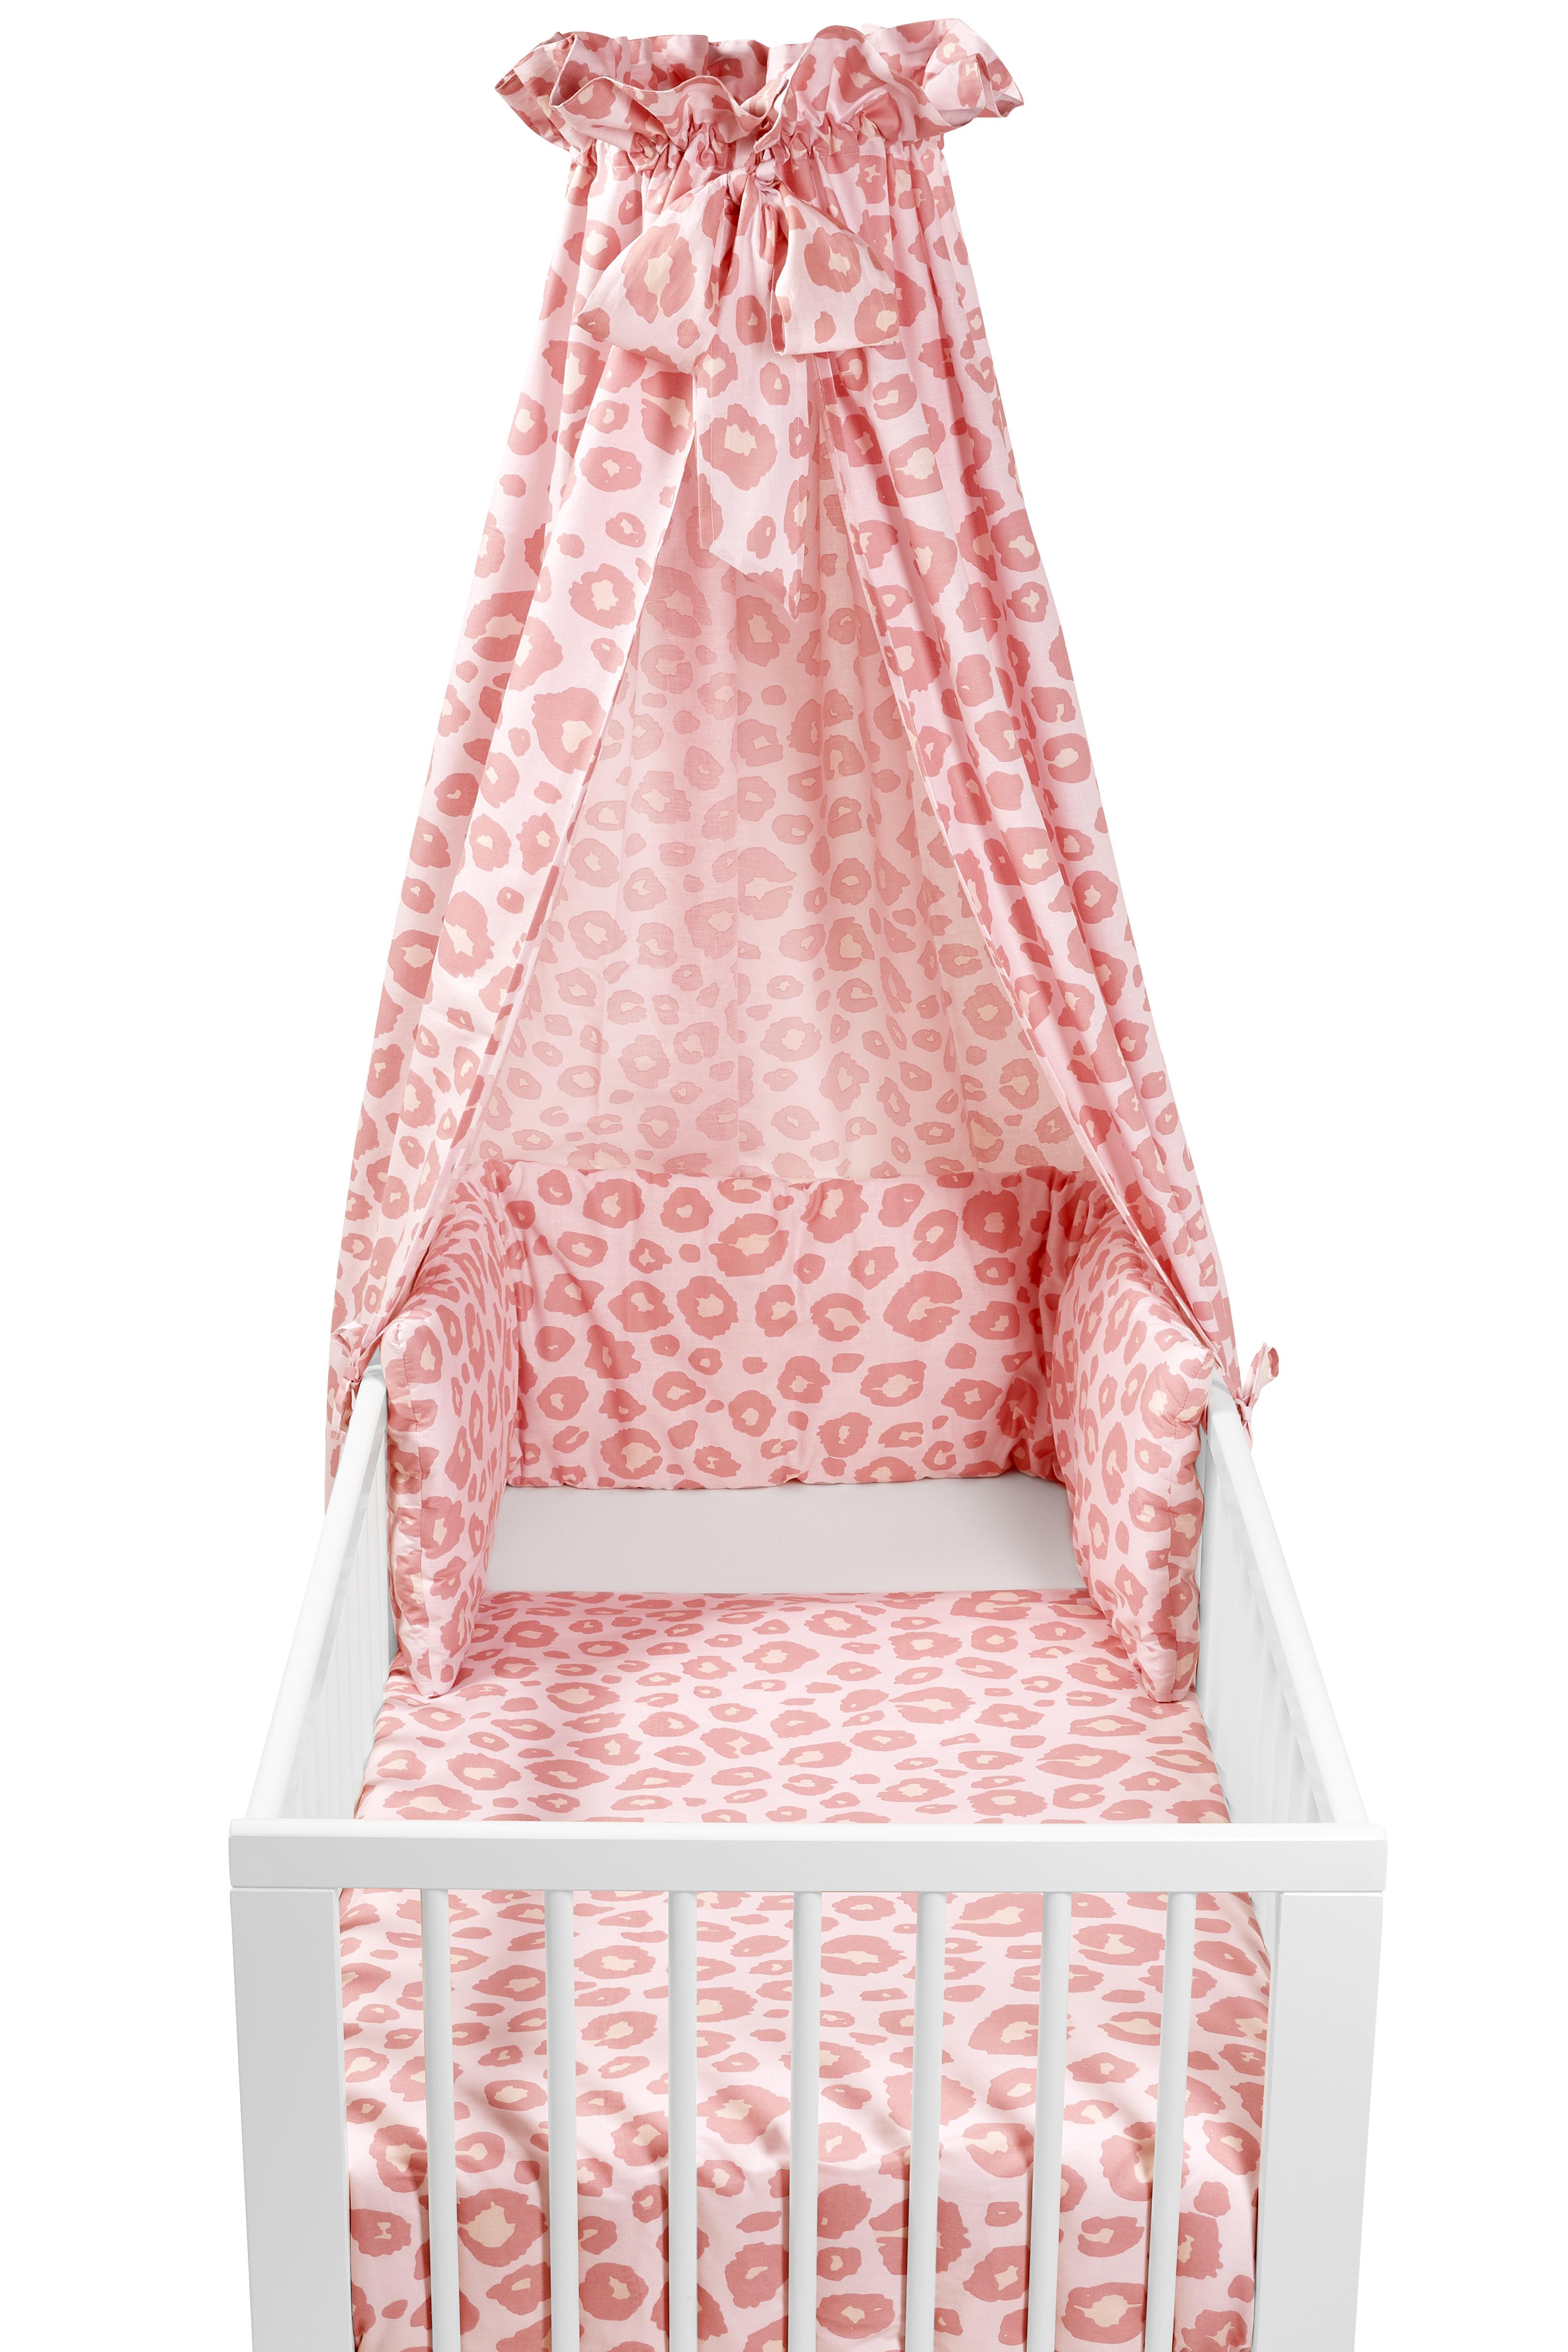 Babyset 4-Delige Ledikant Panter - Panter Pink - 100x135cm